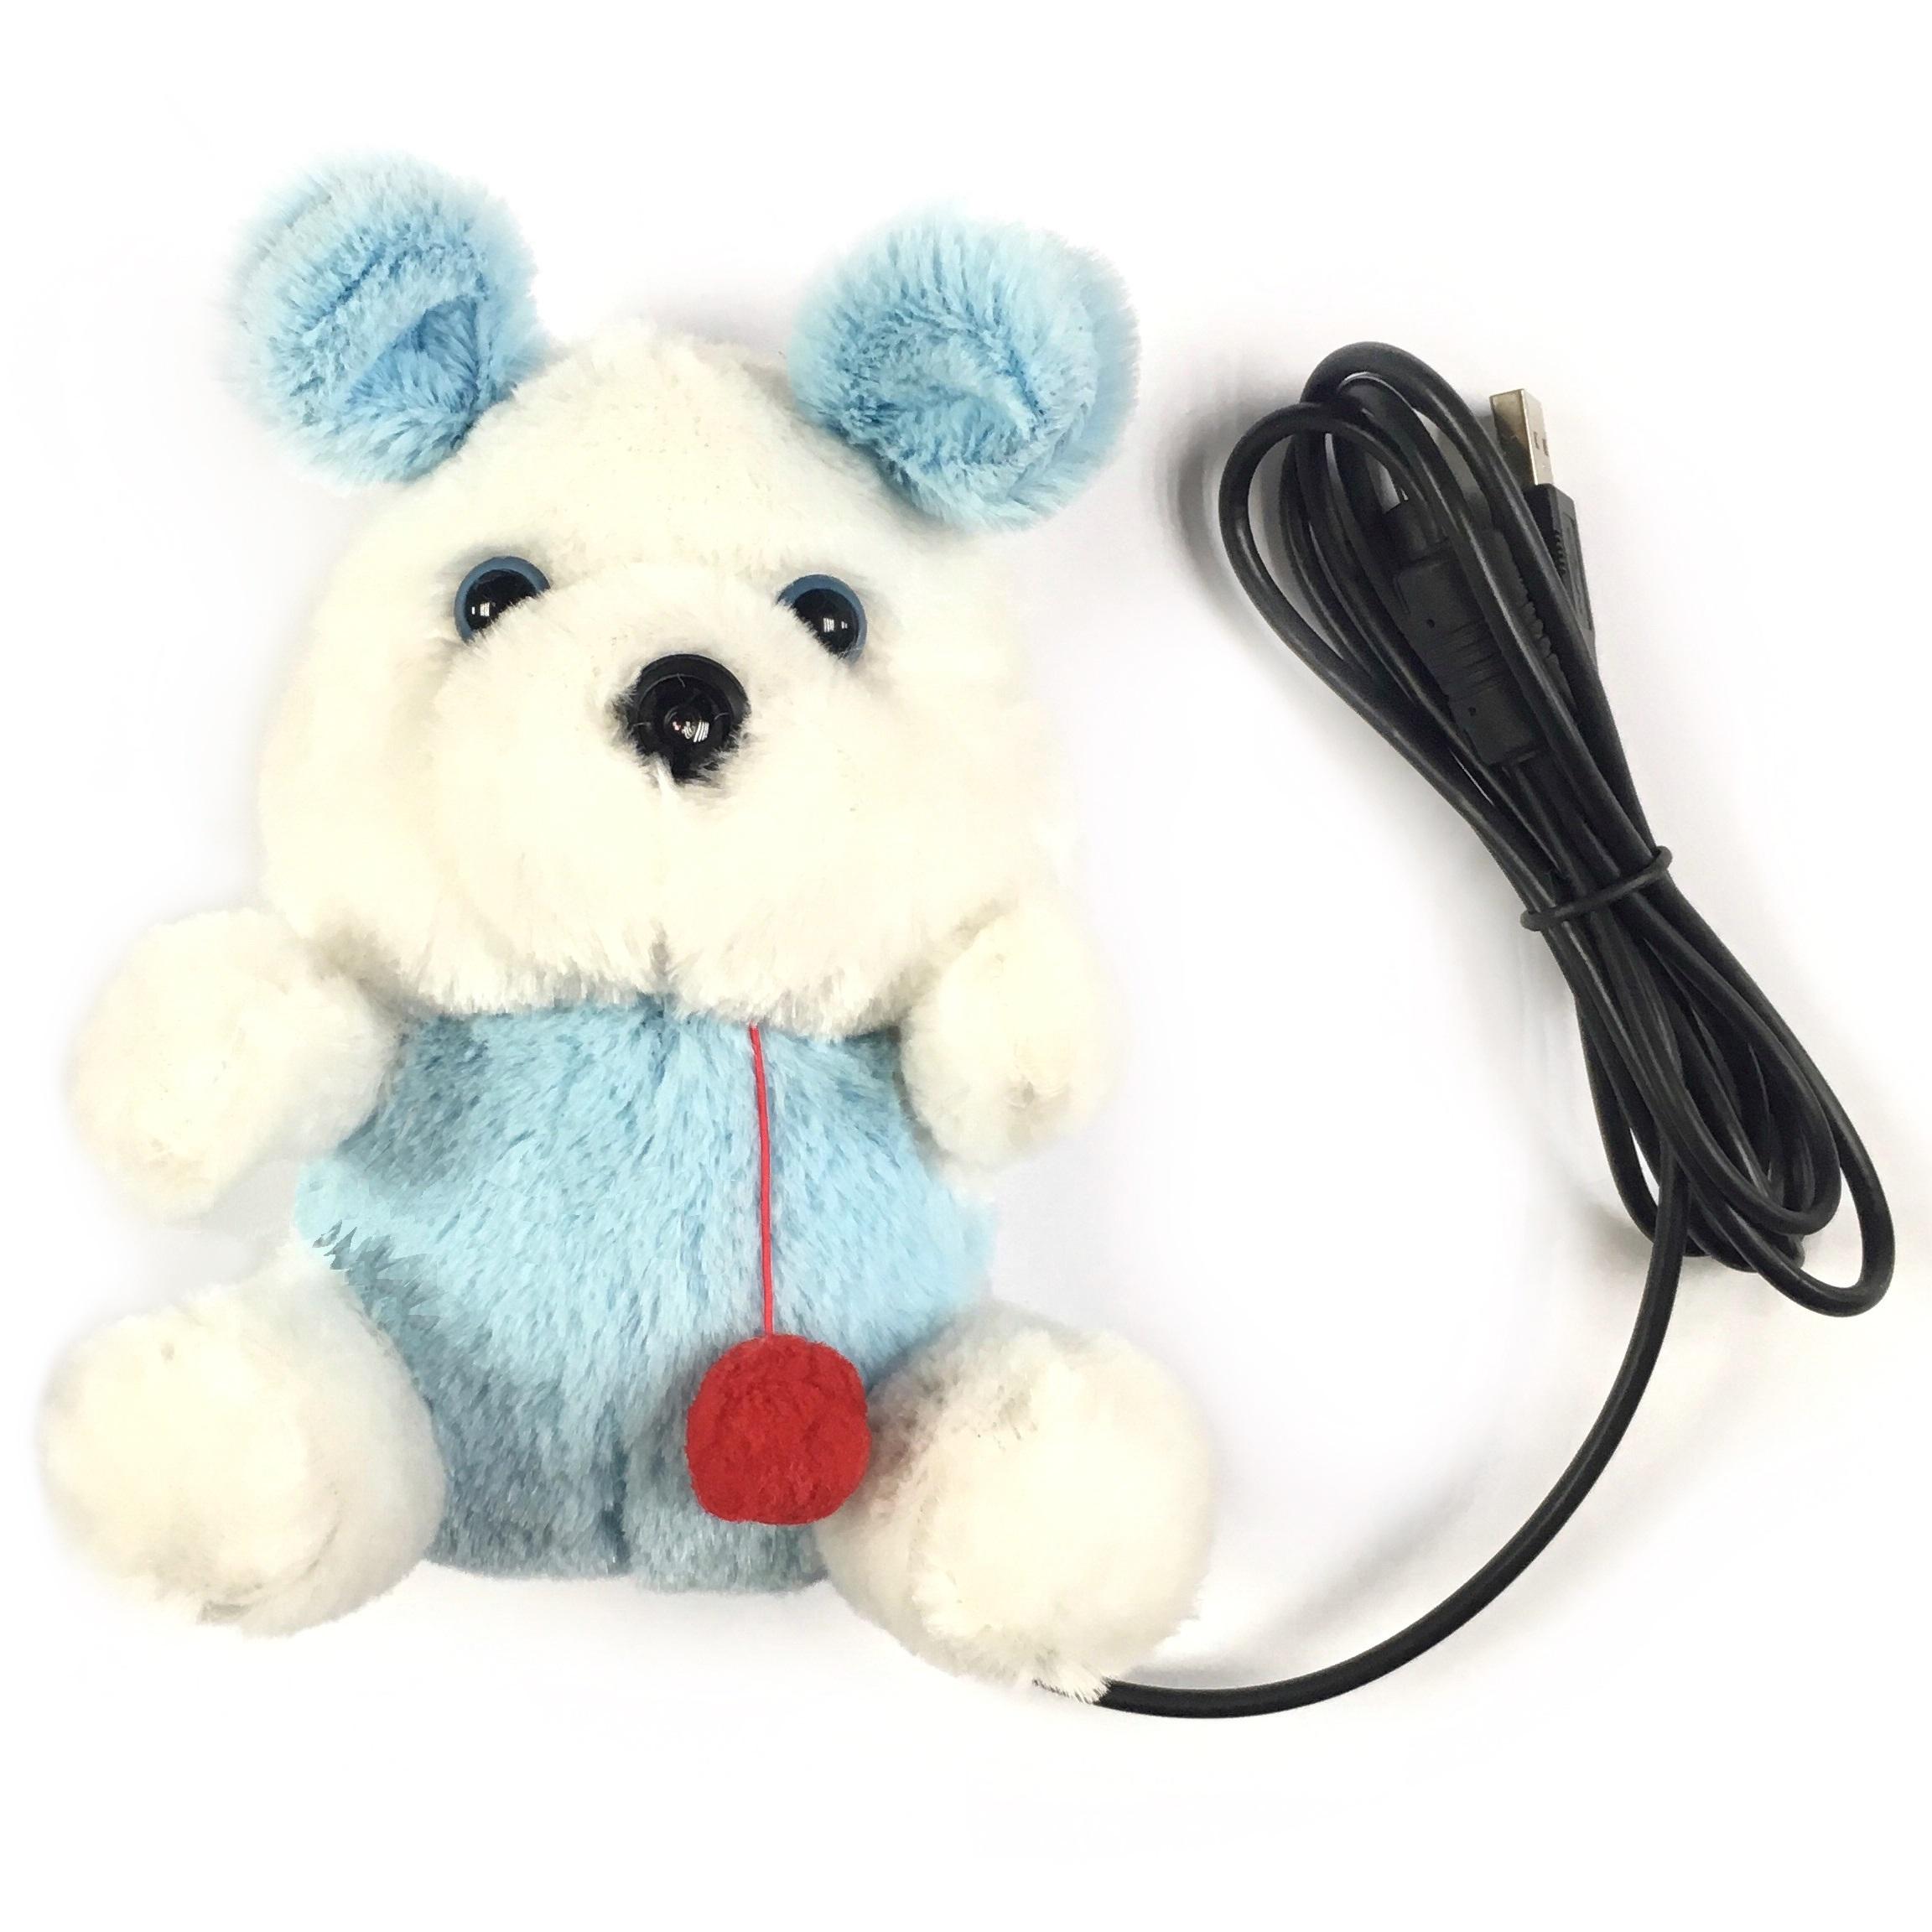 Web-камера AGESTAR S-PC219, Заяц, USB, S-PC219, белый, голубой веб камеры инструкция